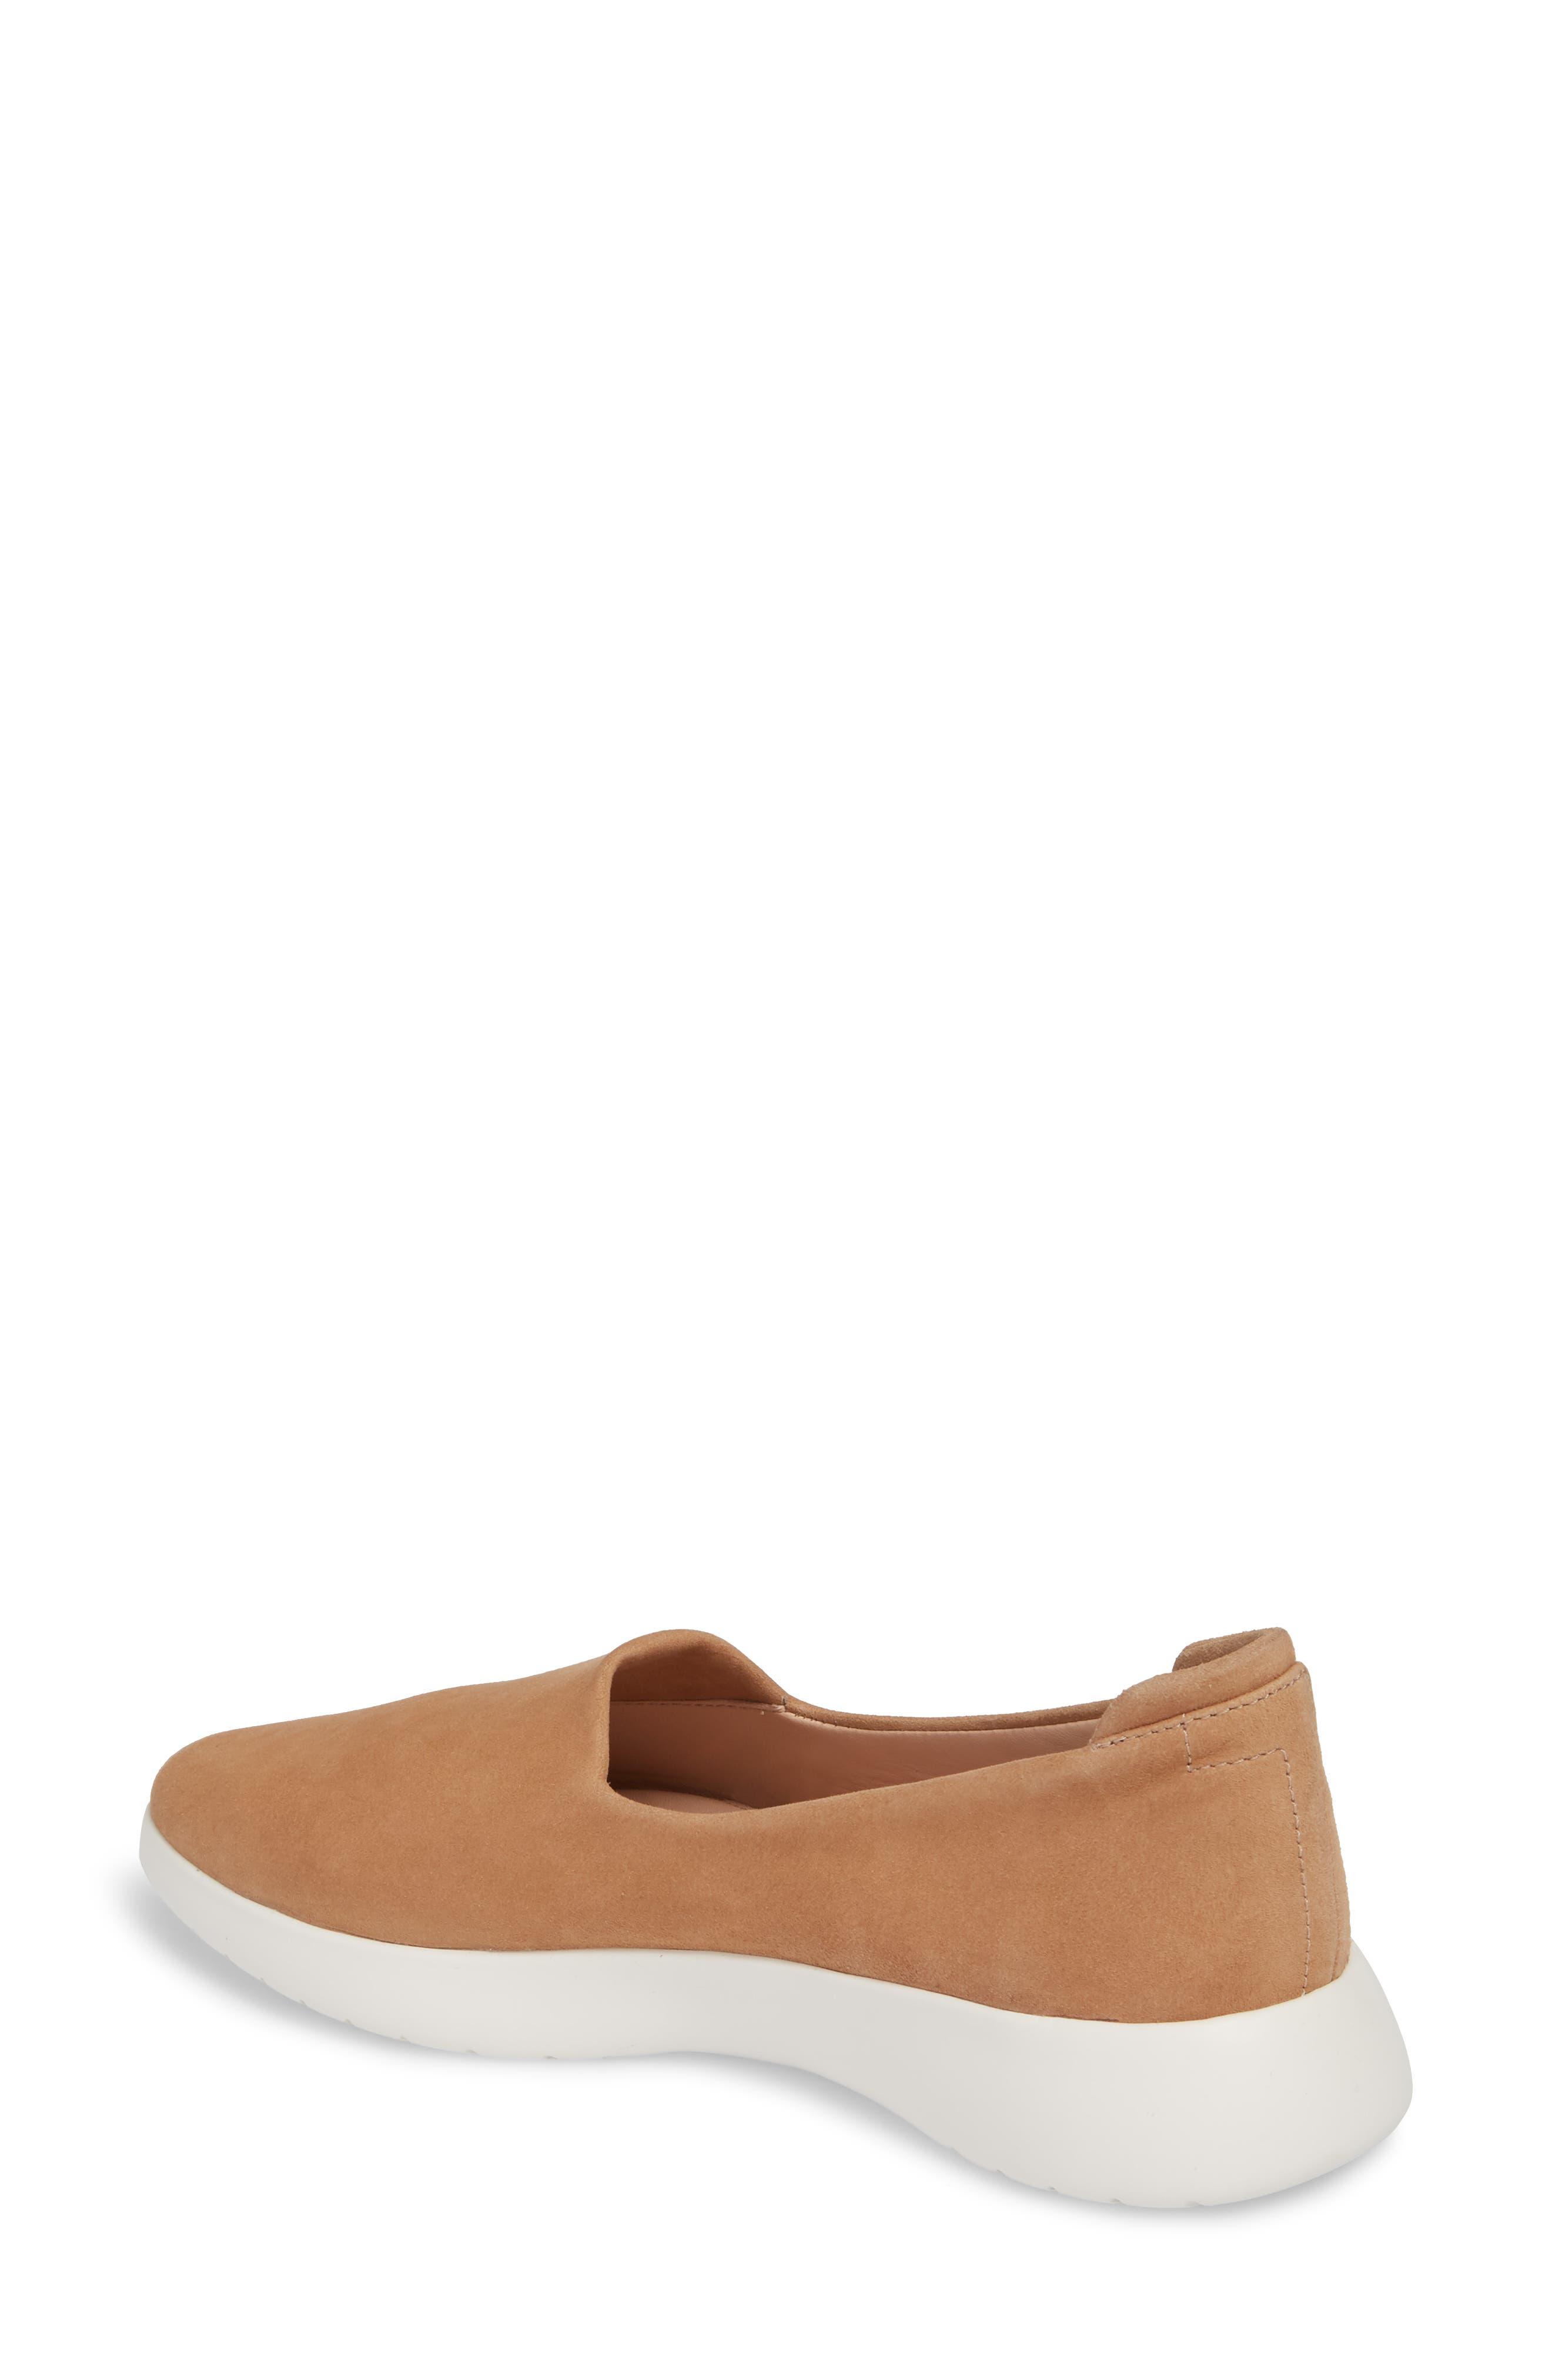 Darla Slip-On Sneaker,                             Alternate thumbnail 2, color,                             SOFT BEIGE SUEDE